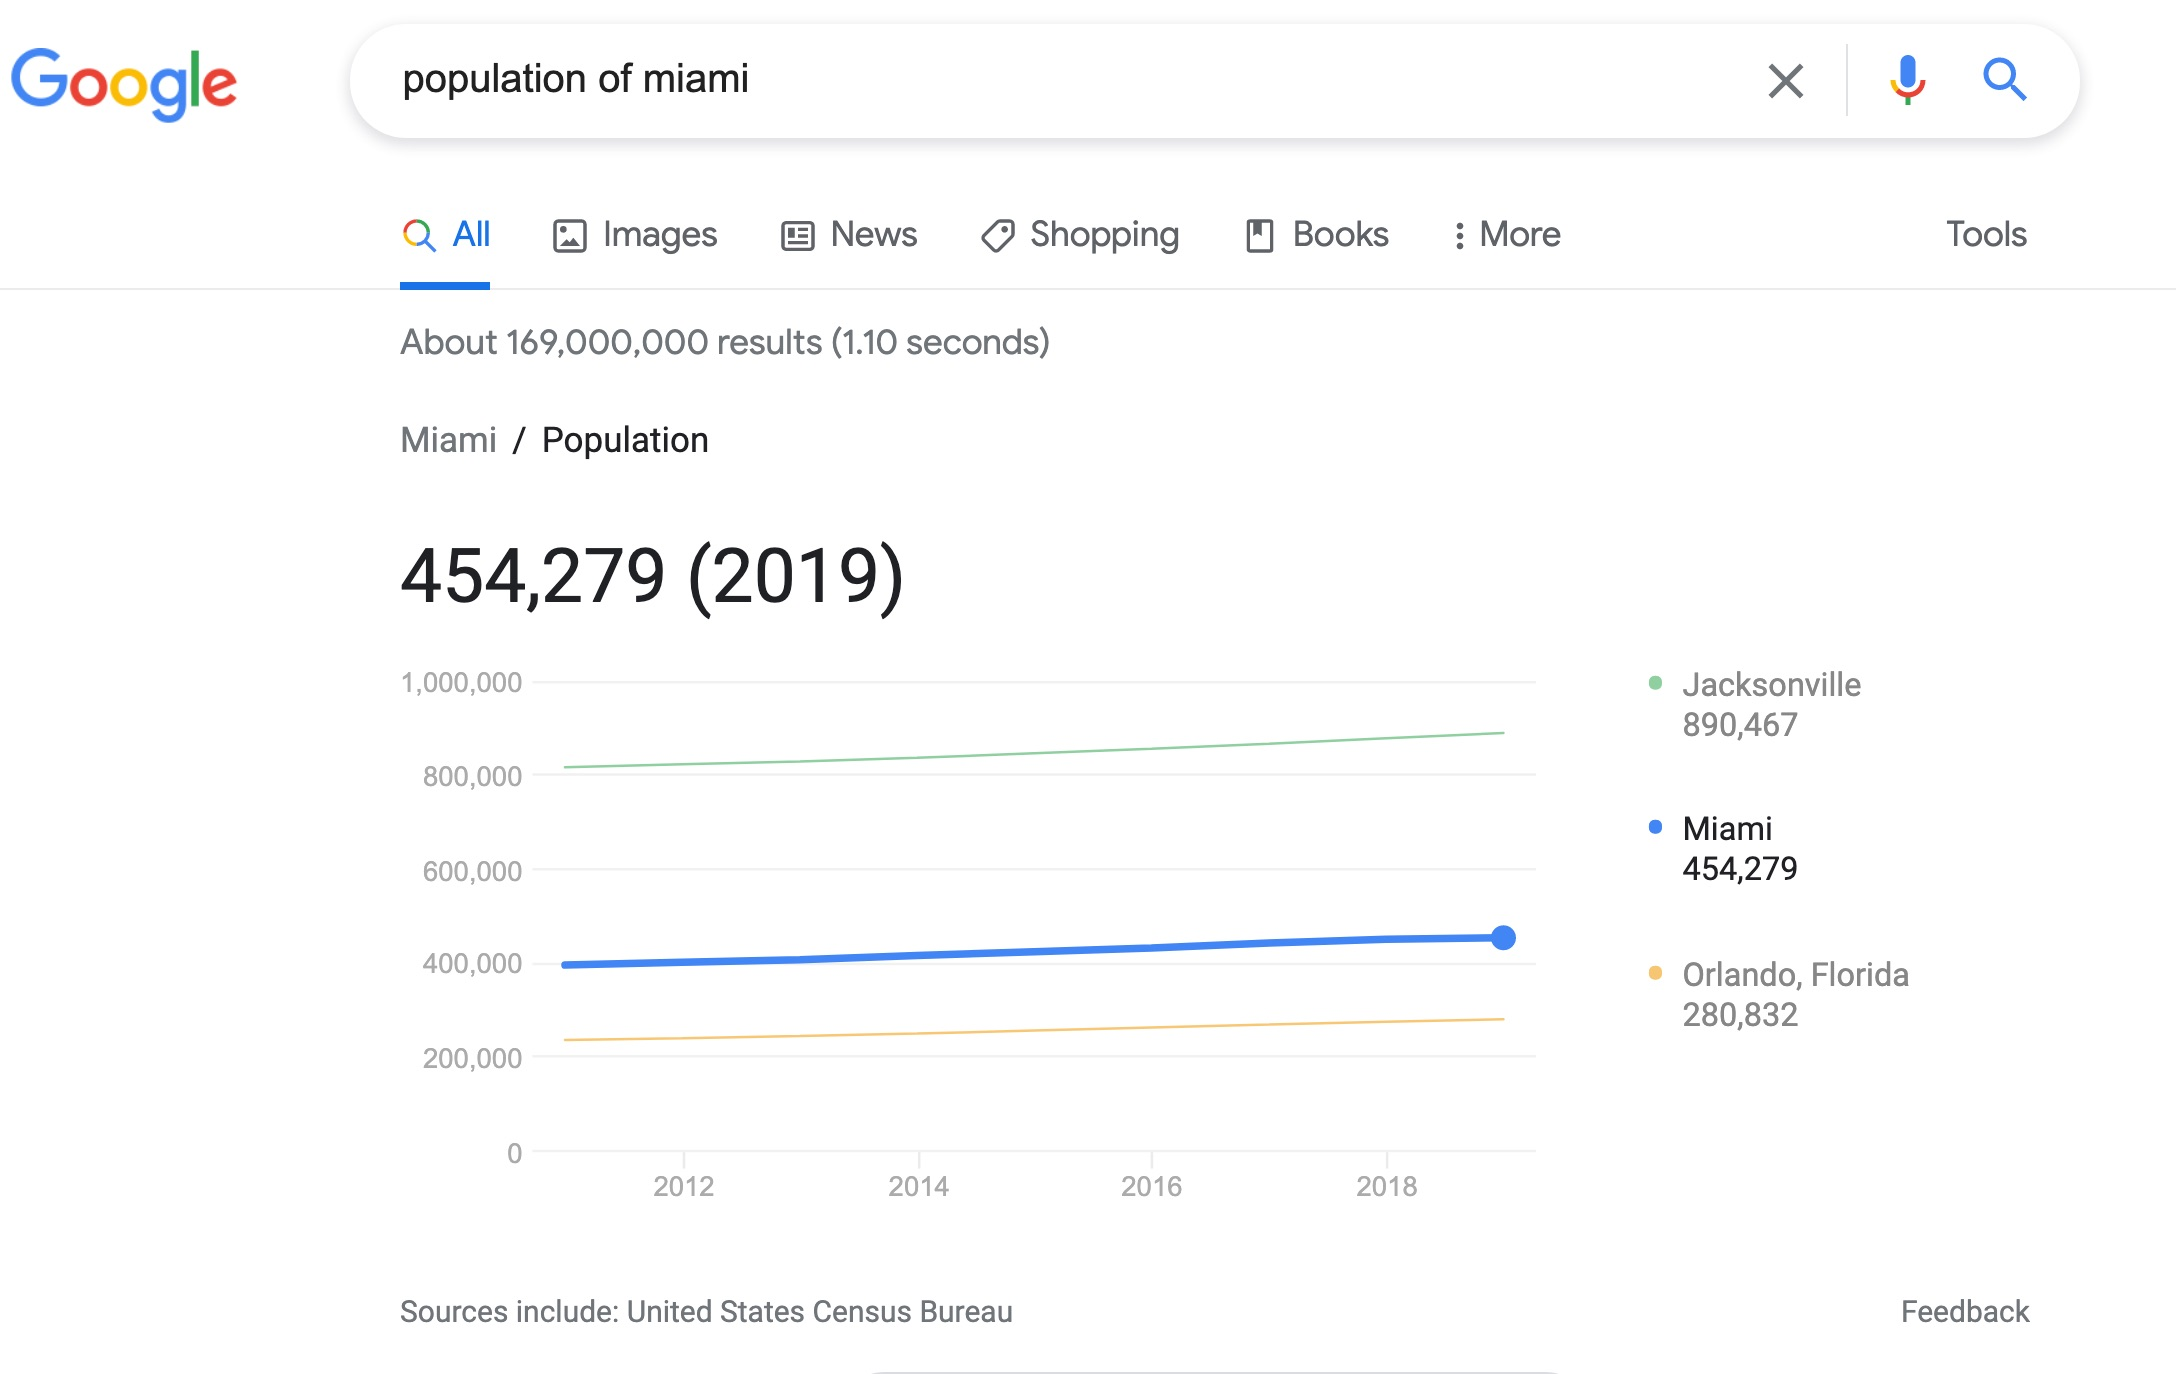 population of miami